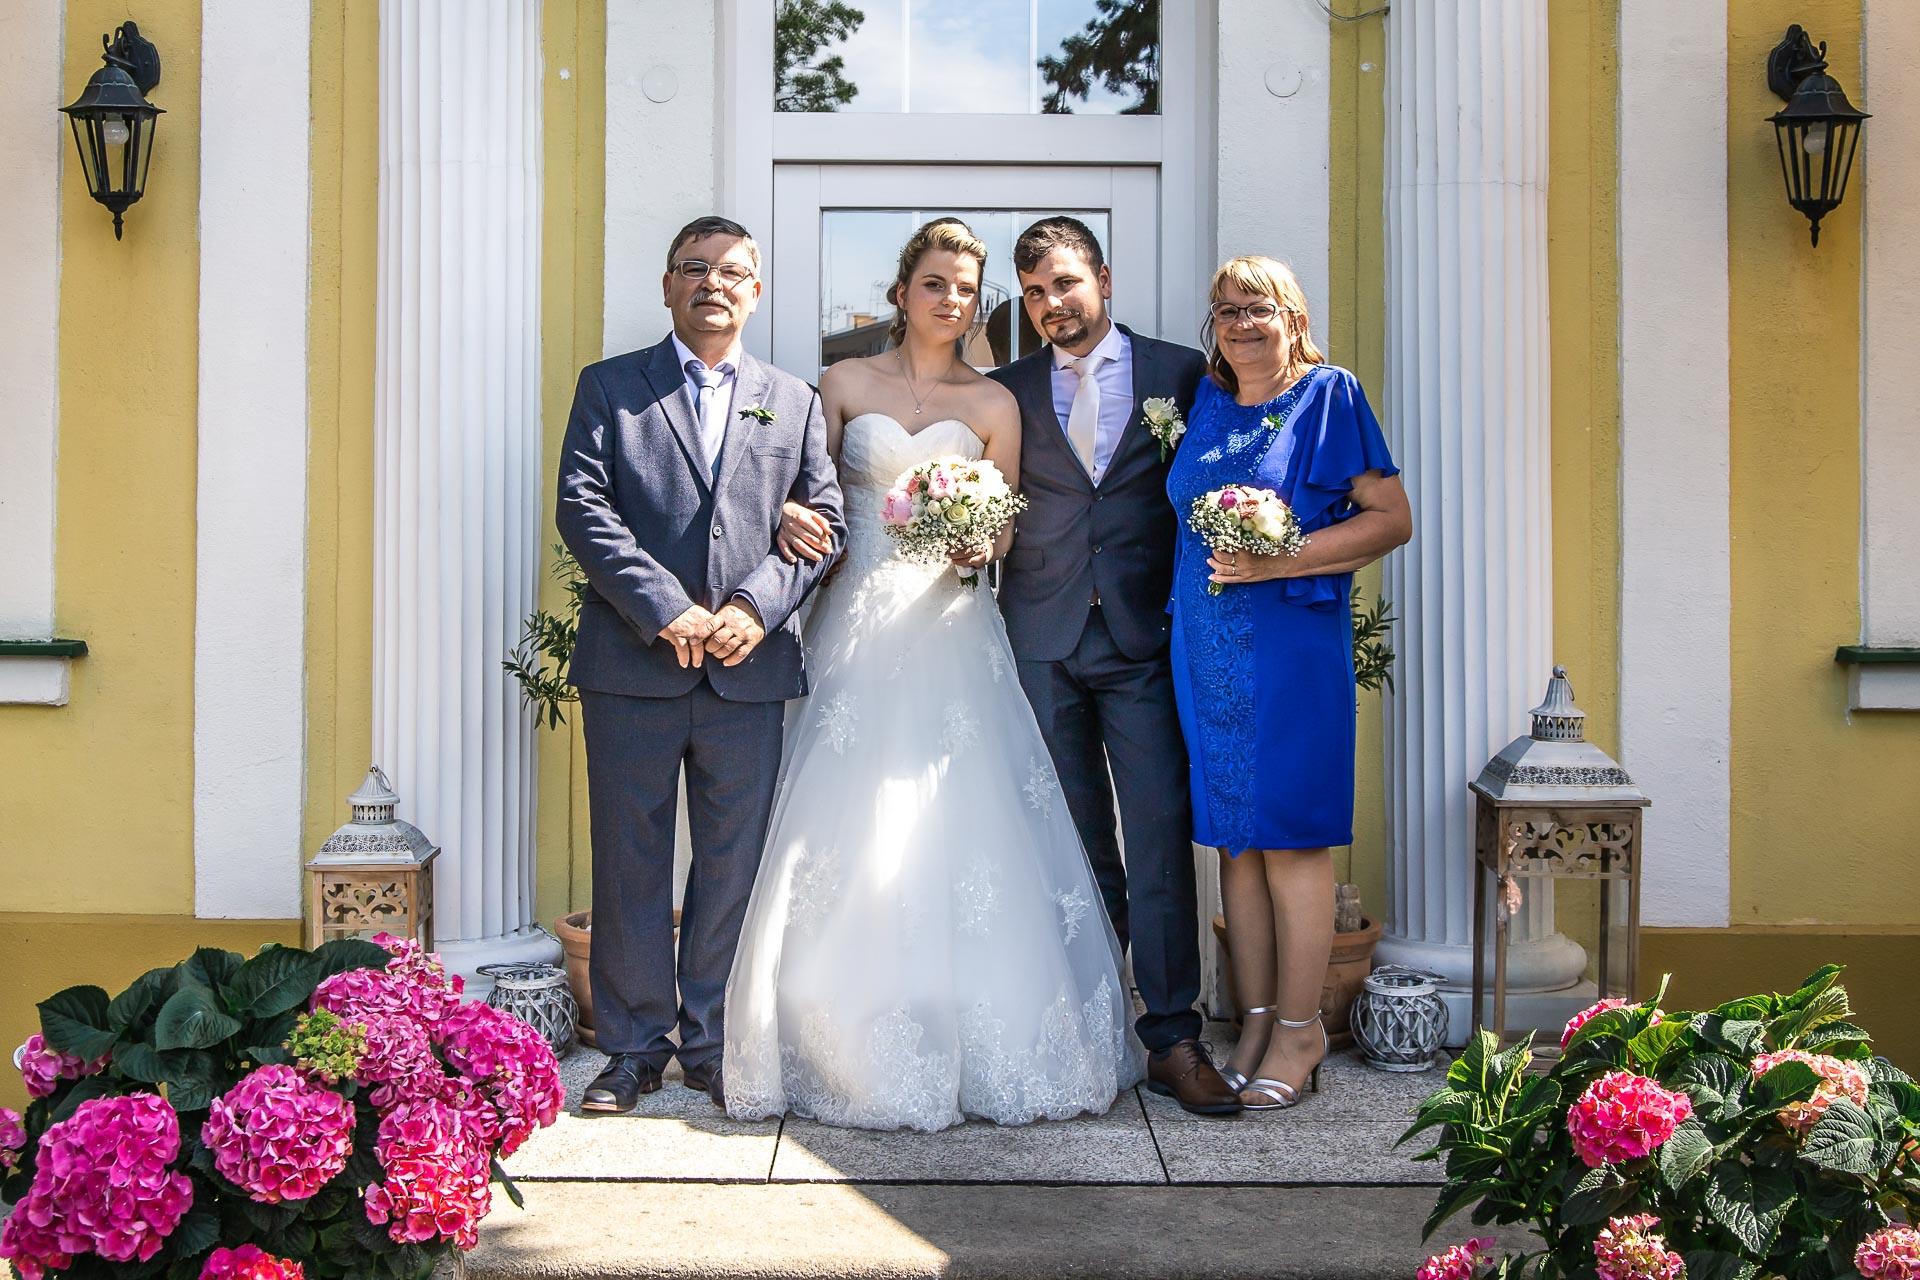 Svatební-fotograf-Nymburk-5657